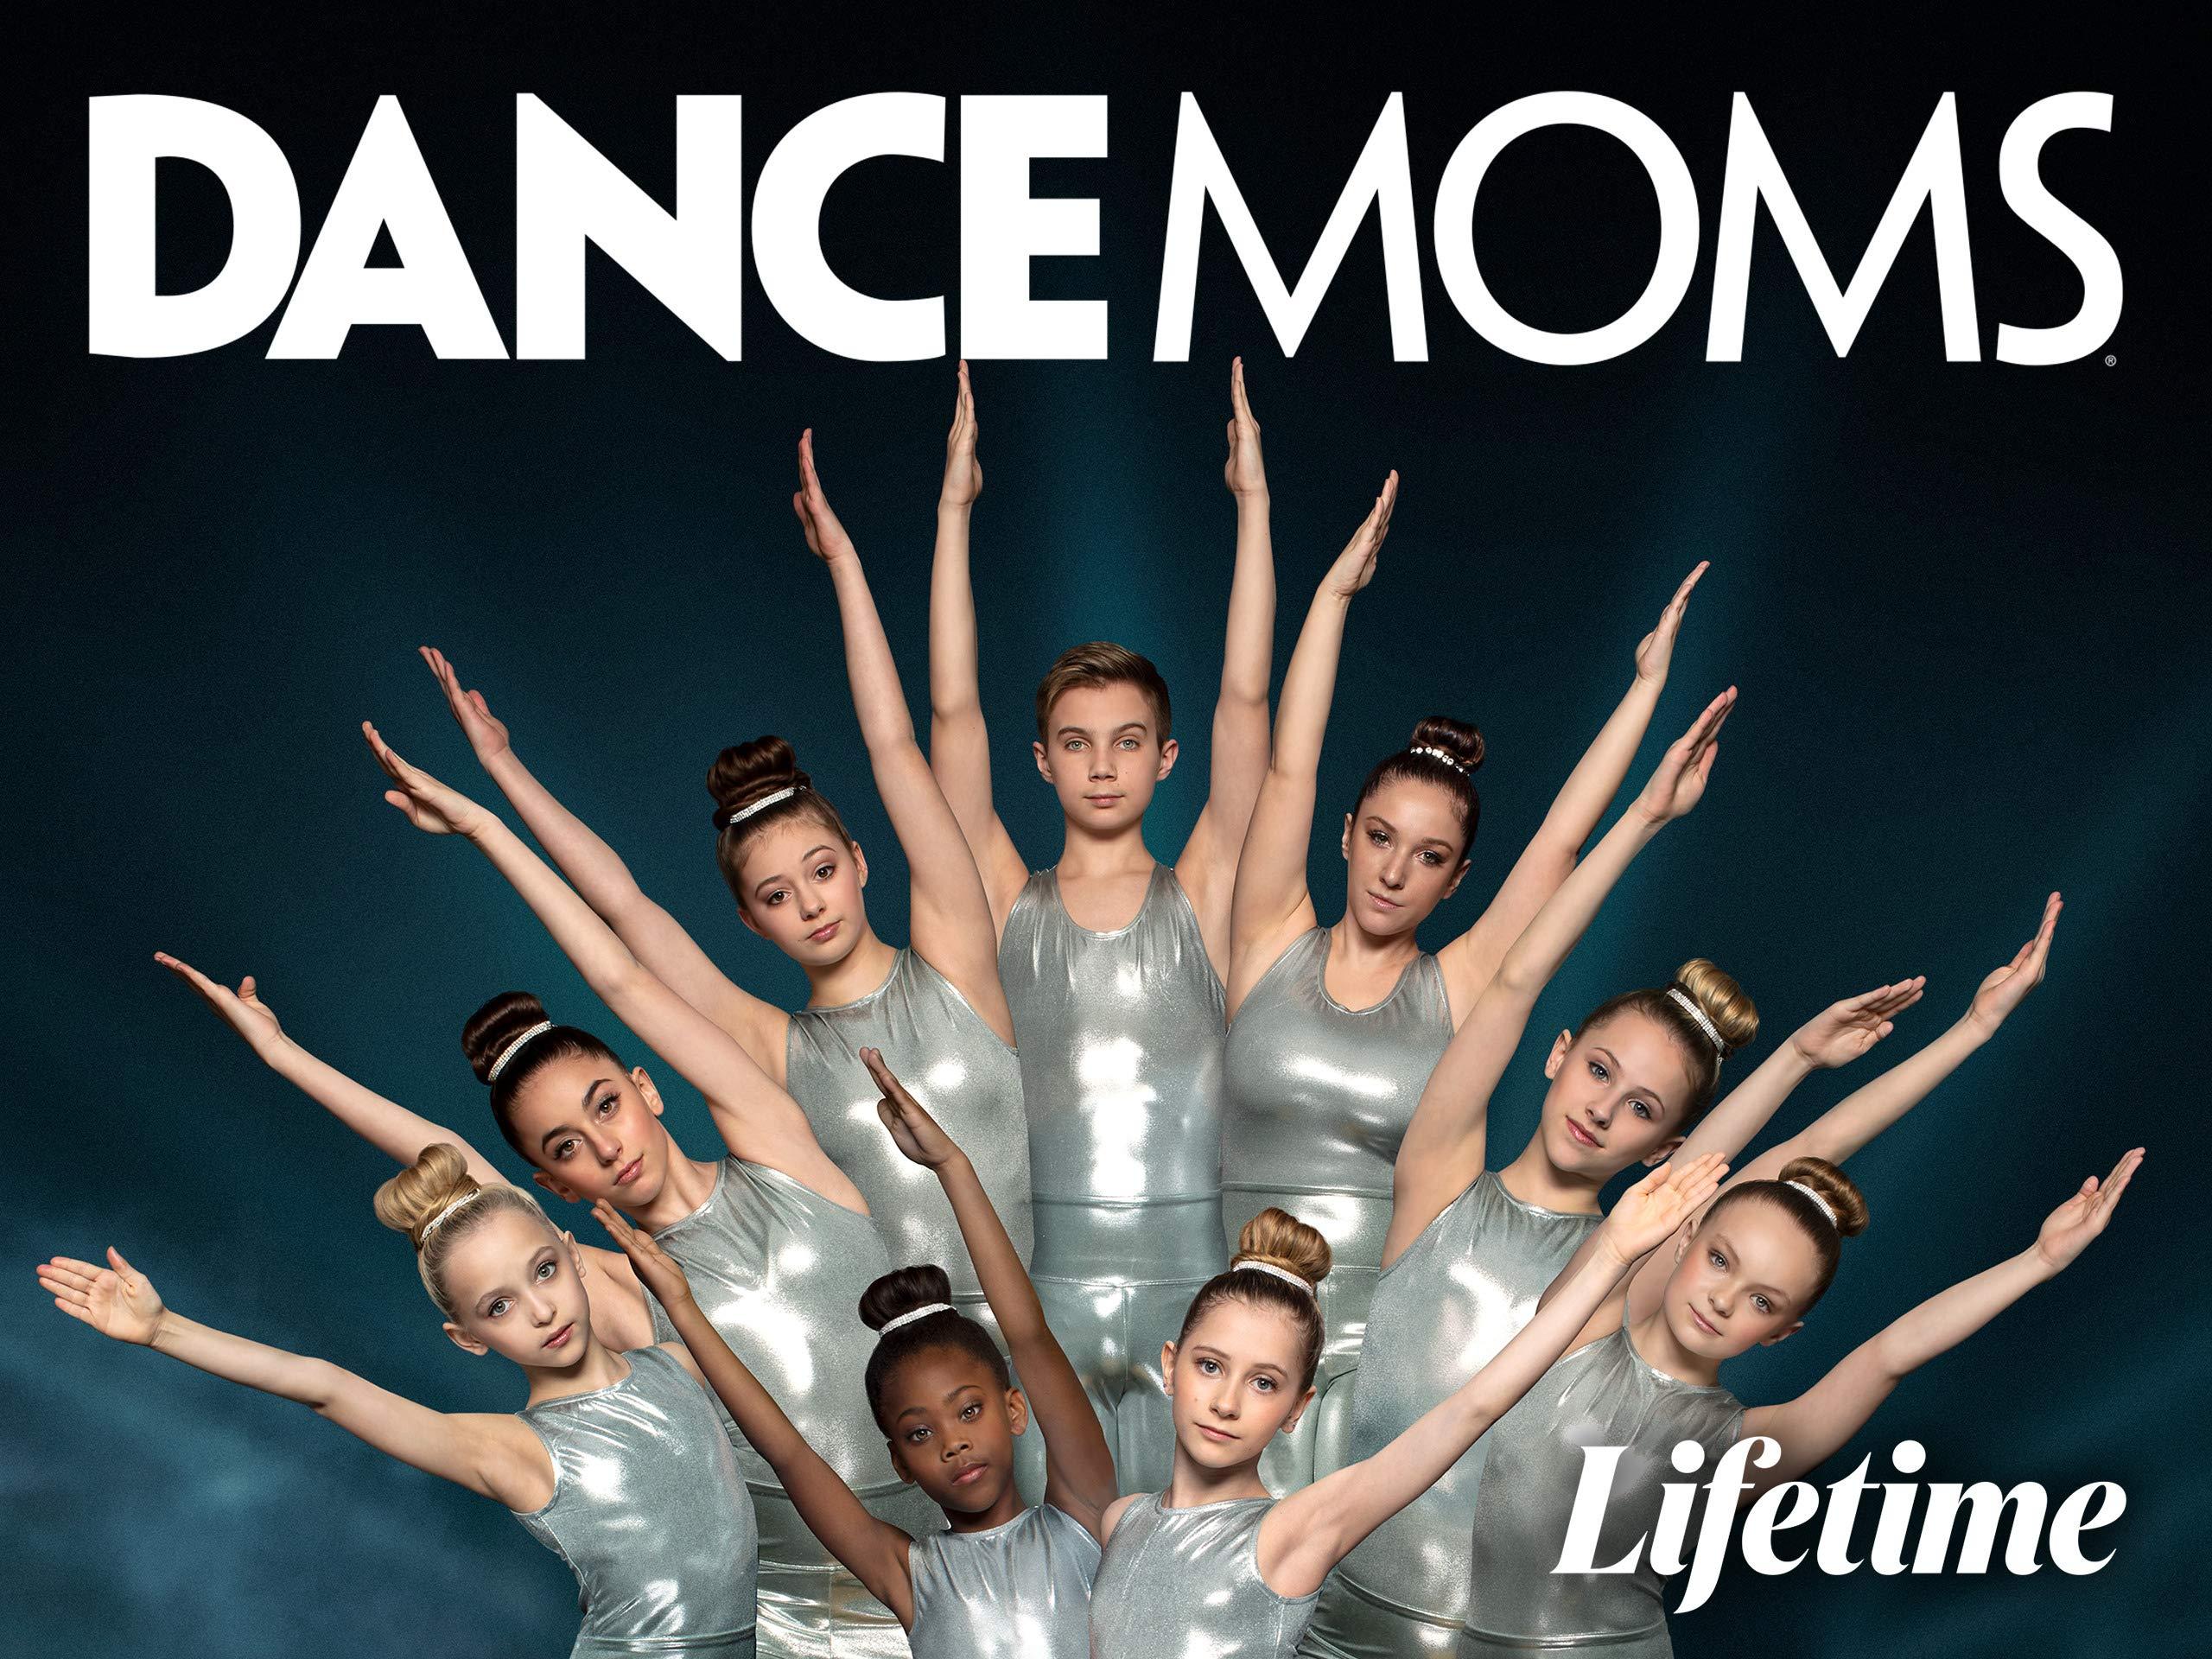 Watch Dance Moms Season 8 Prime Video